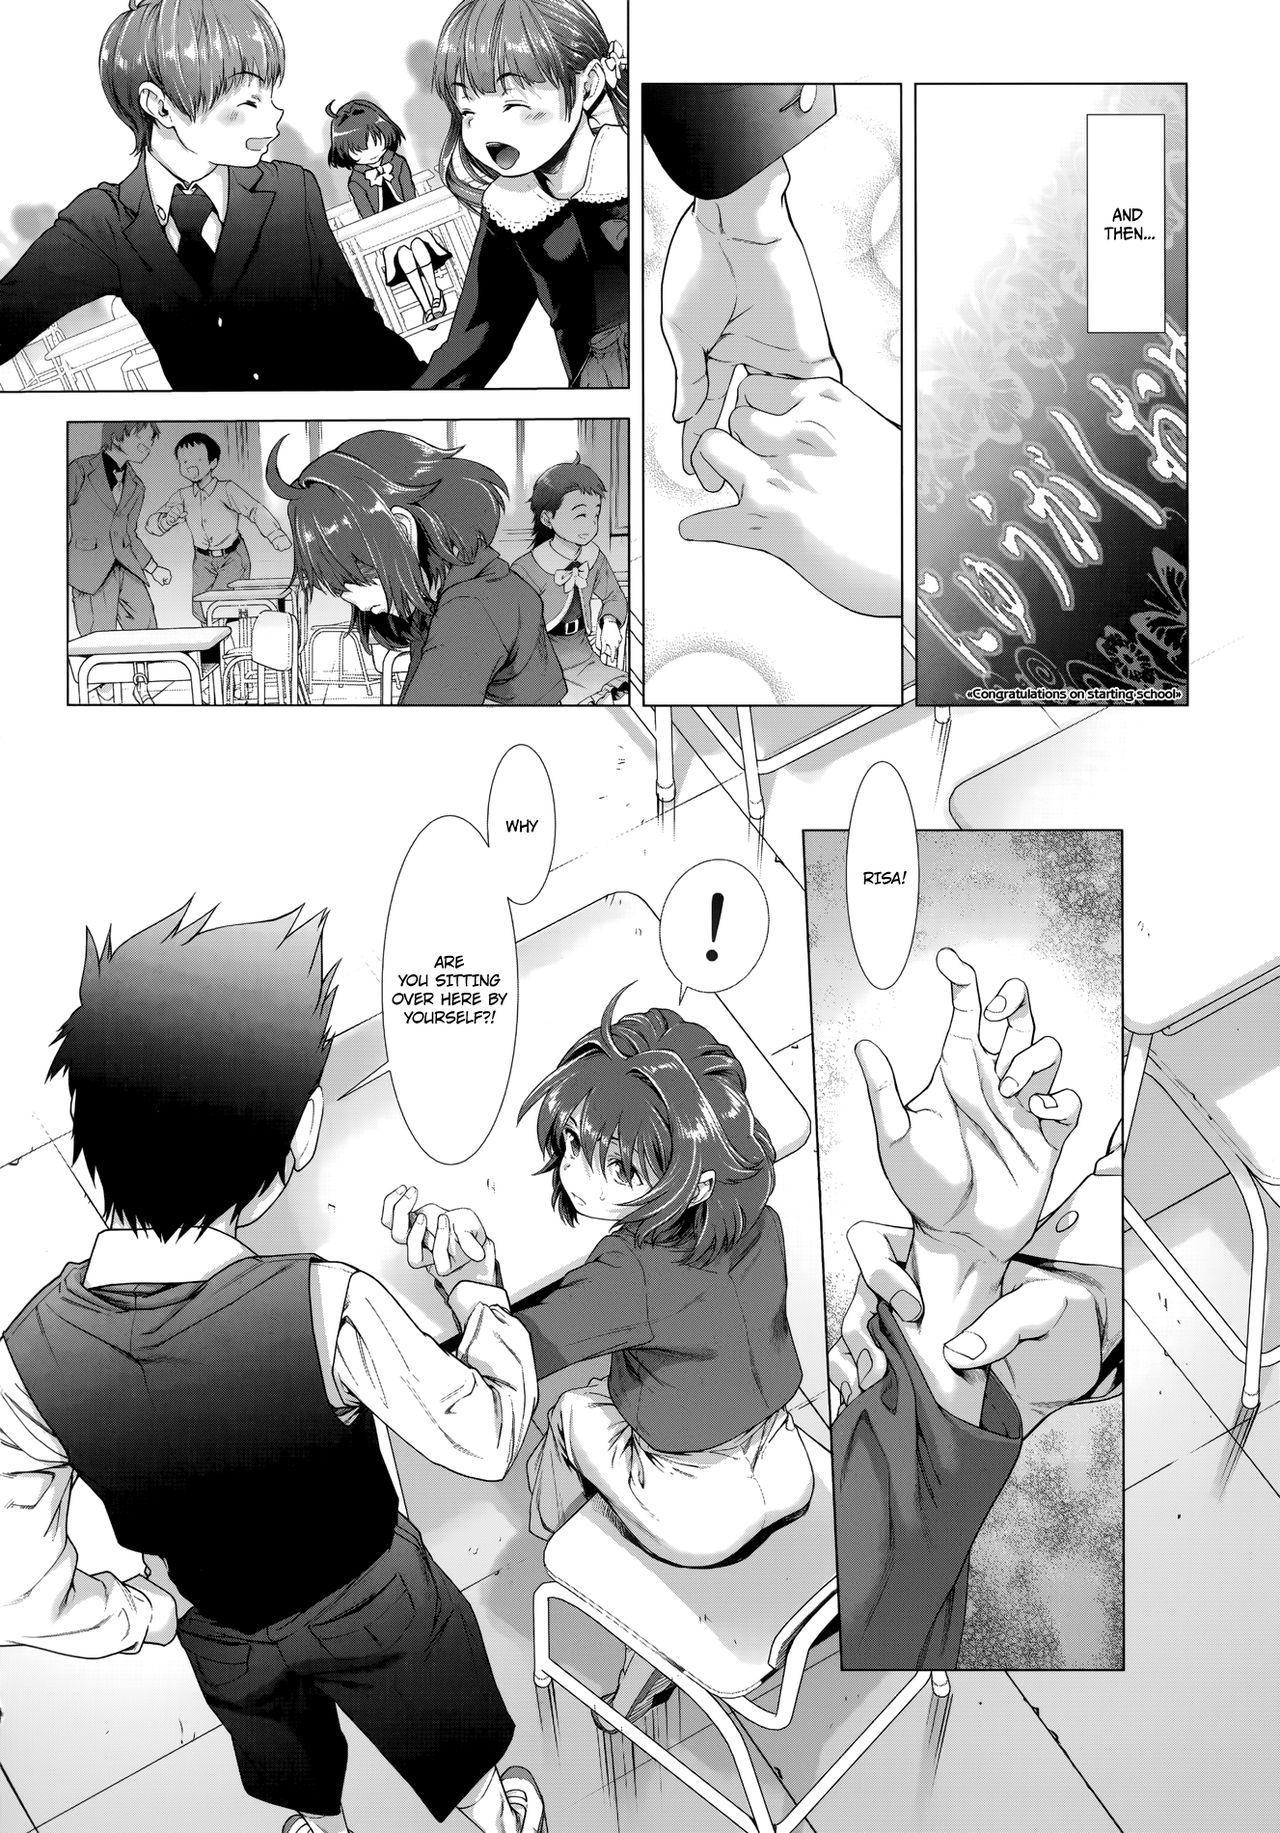 [Sannyuutei Shinta] Chinpotsuki Ijimerarekko | «Dickgirl!», The Bullying Story - Ch. 1-4 [English] [34th squad] 11